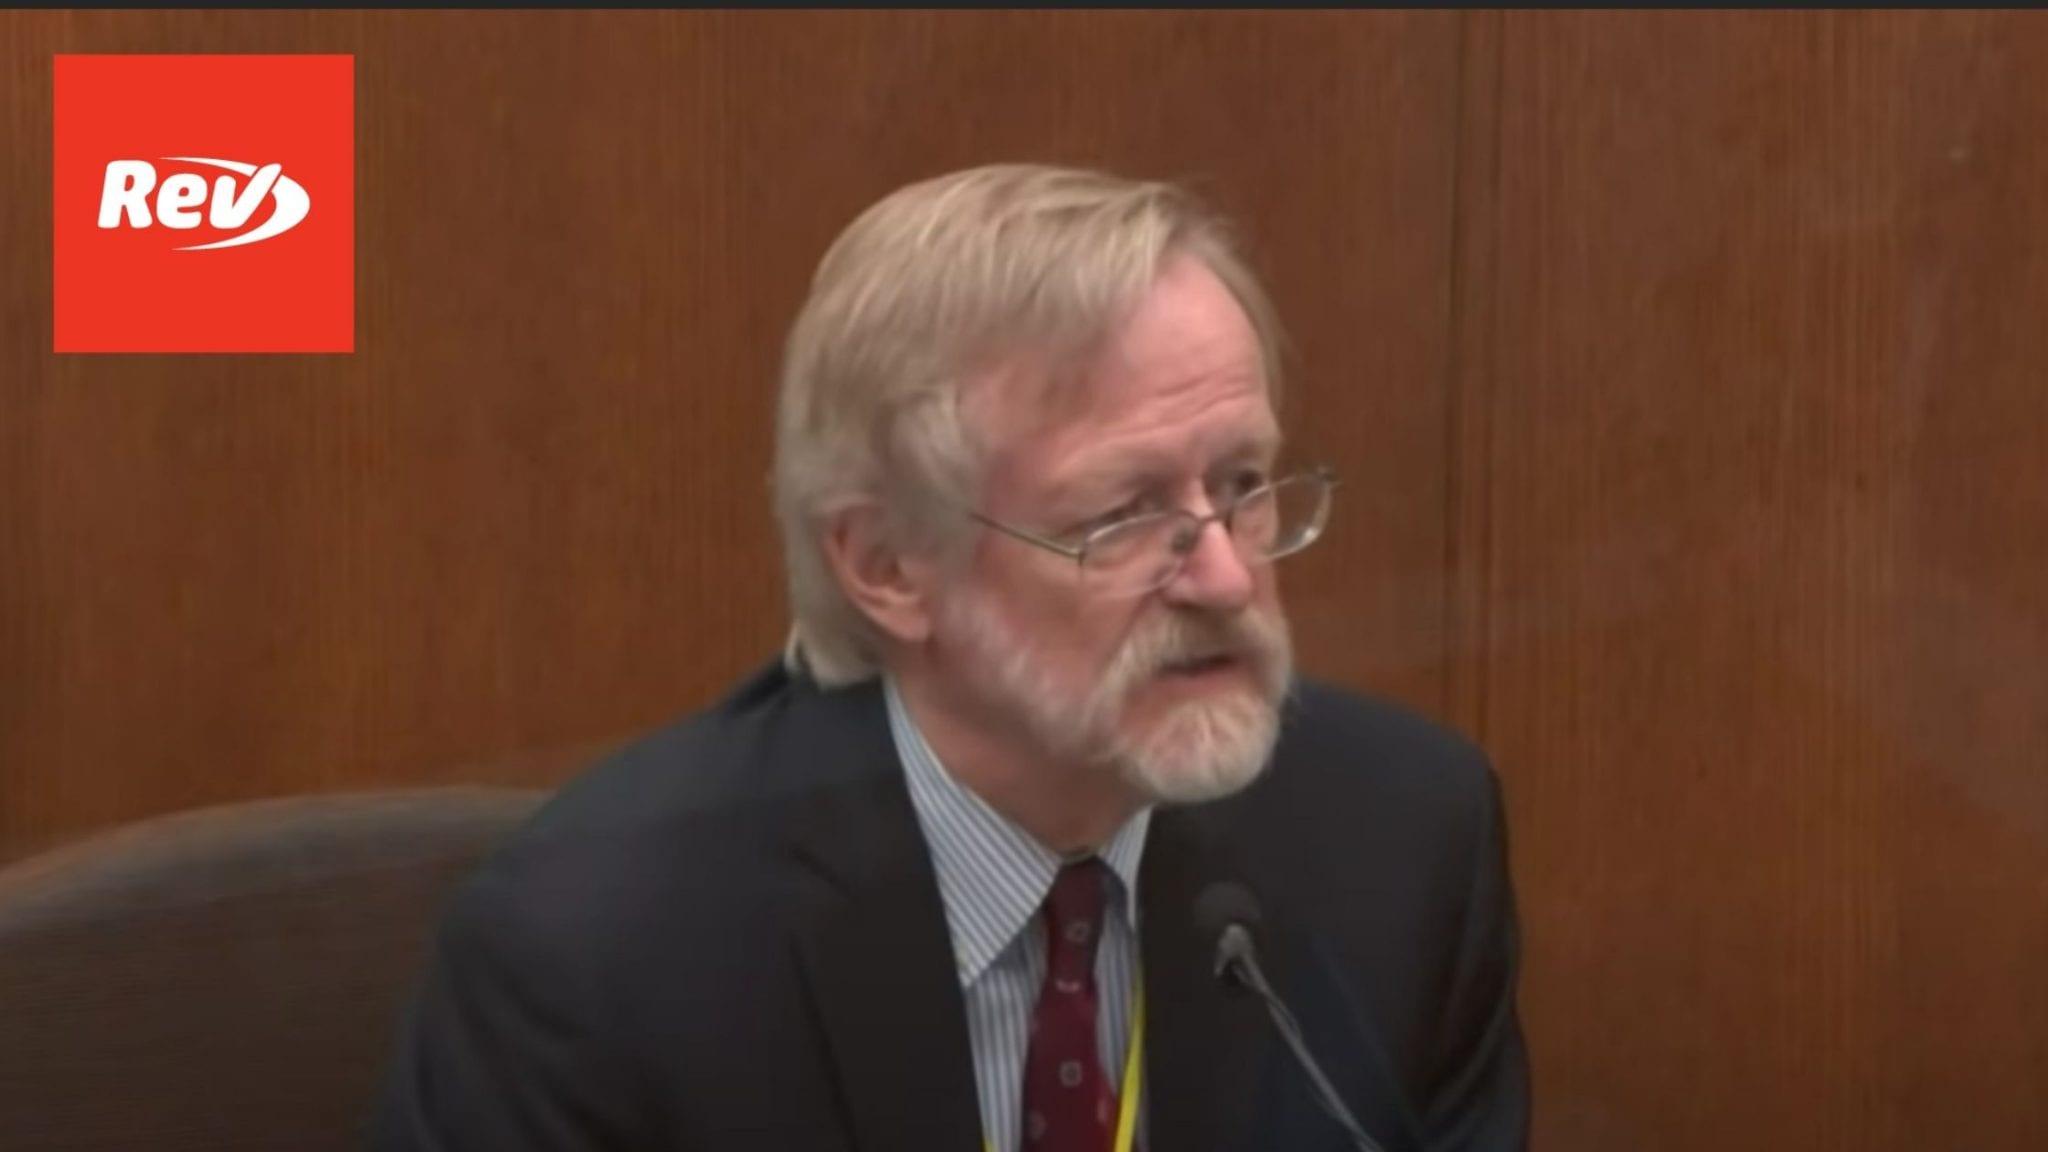 Pulmonologist Martin Tobin Testimony Derek Chauvin Trial Transcript: Floyd's Respiratory Rates